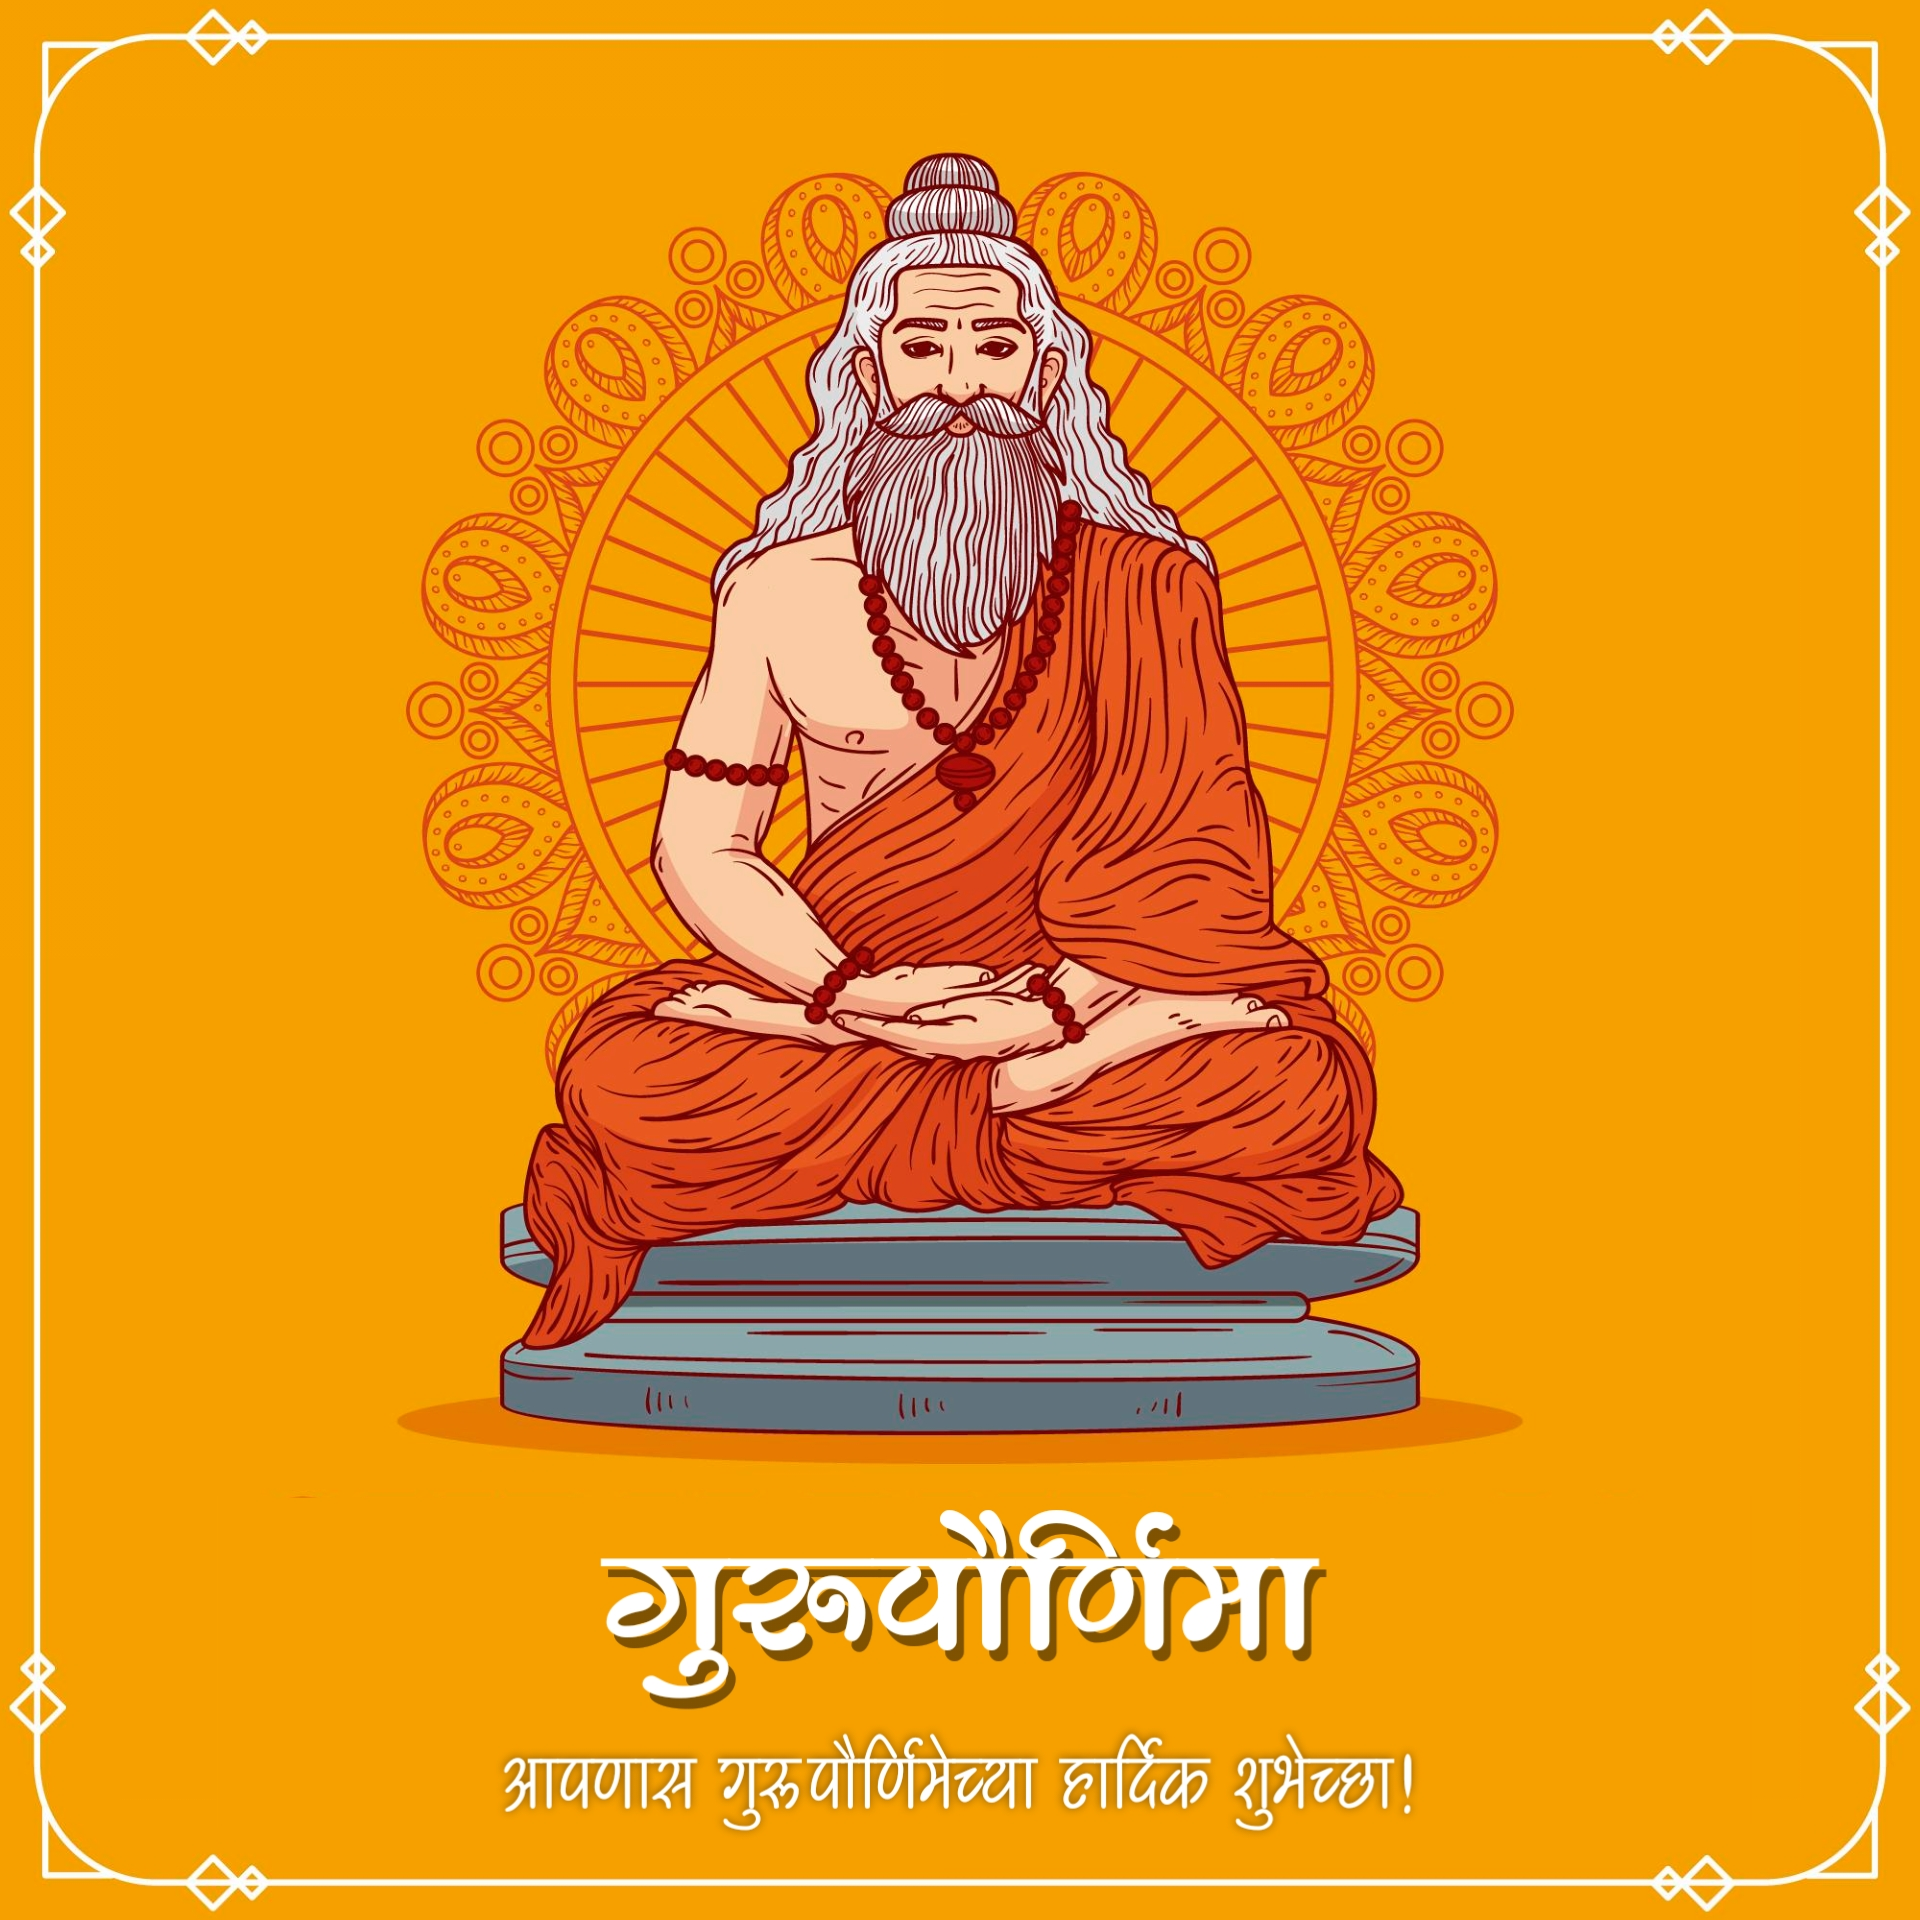 गुरु हा संतकुळीचा राजा। गुरु हा प्राणविसावा माझा।